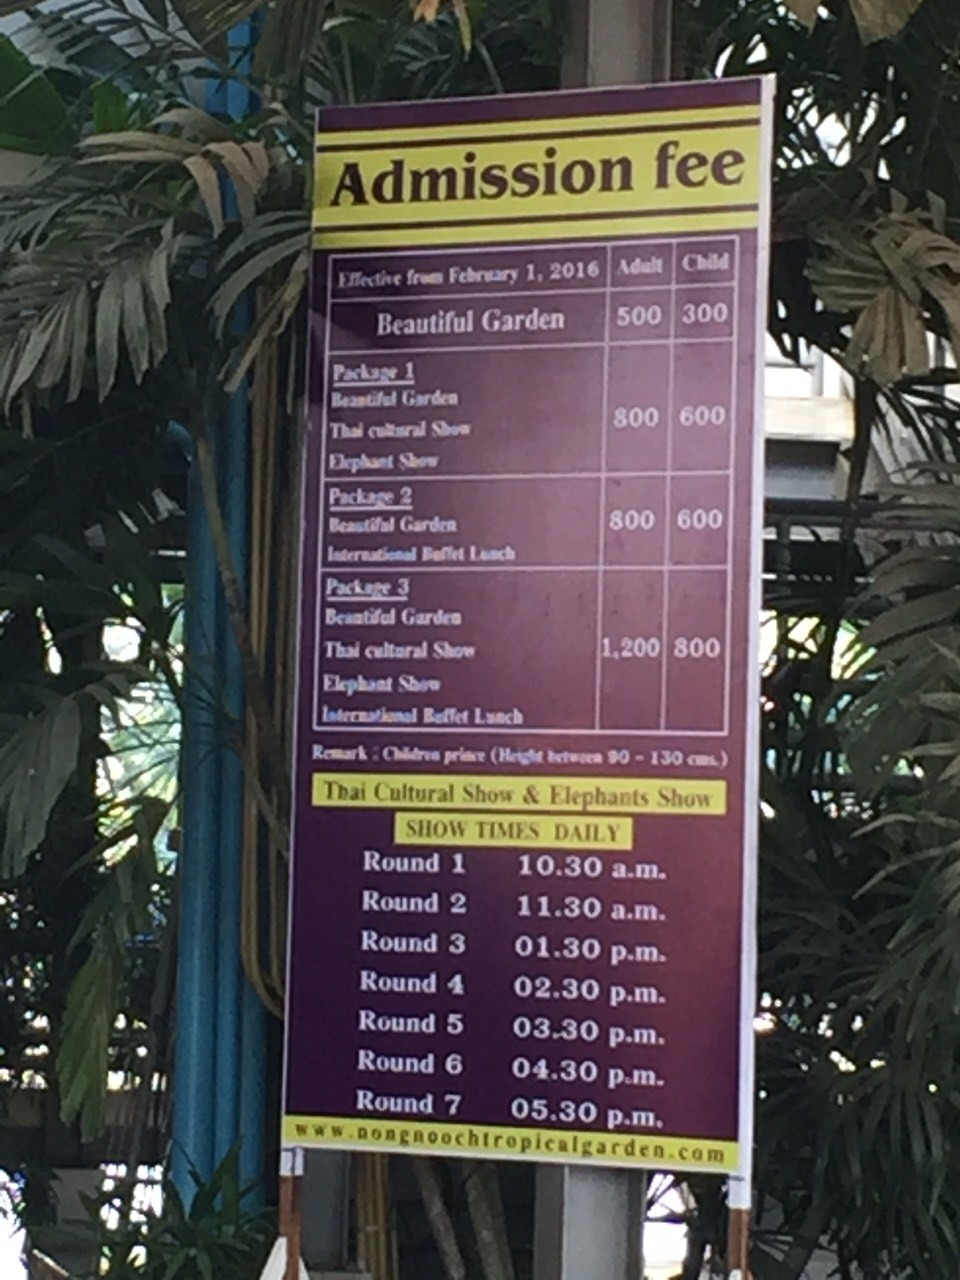 Nong Nuch Garden Ticket Price